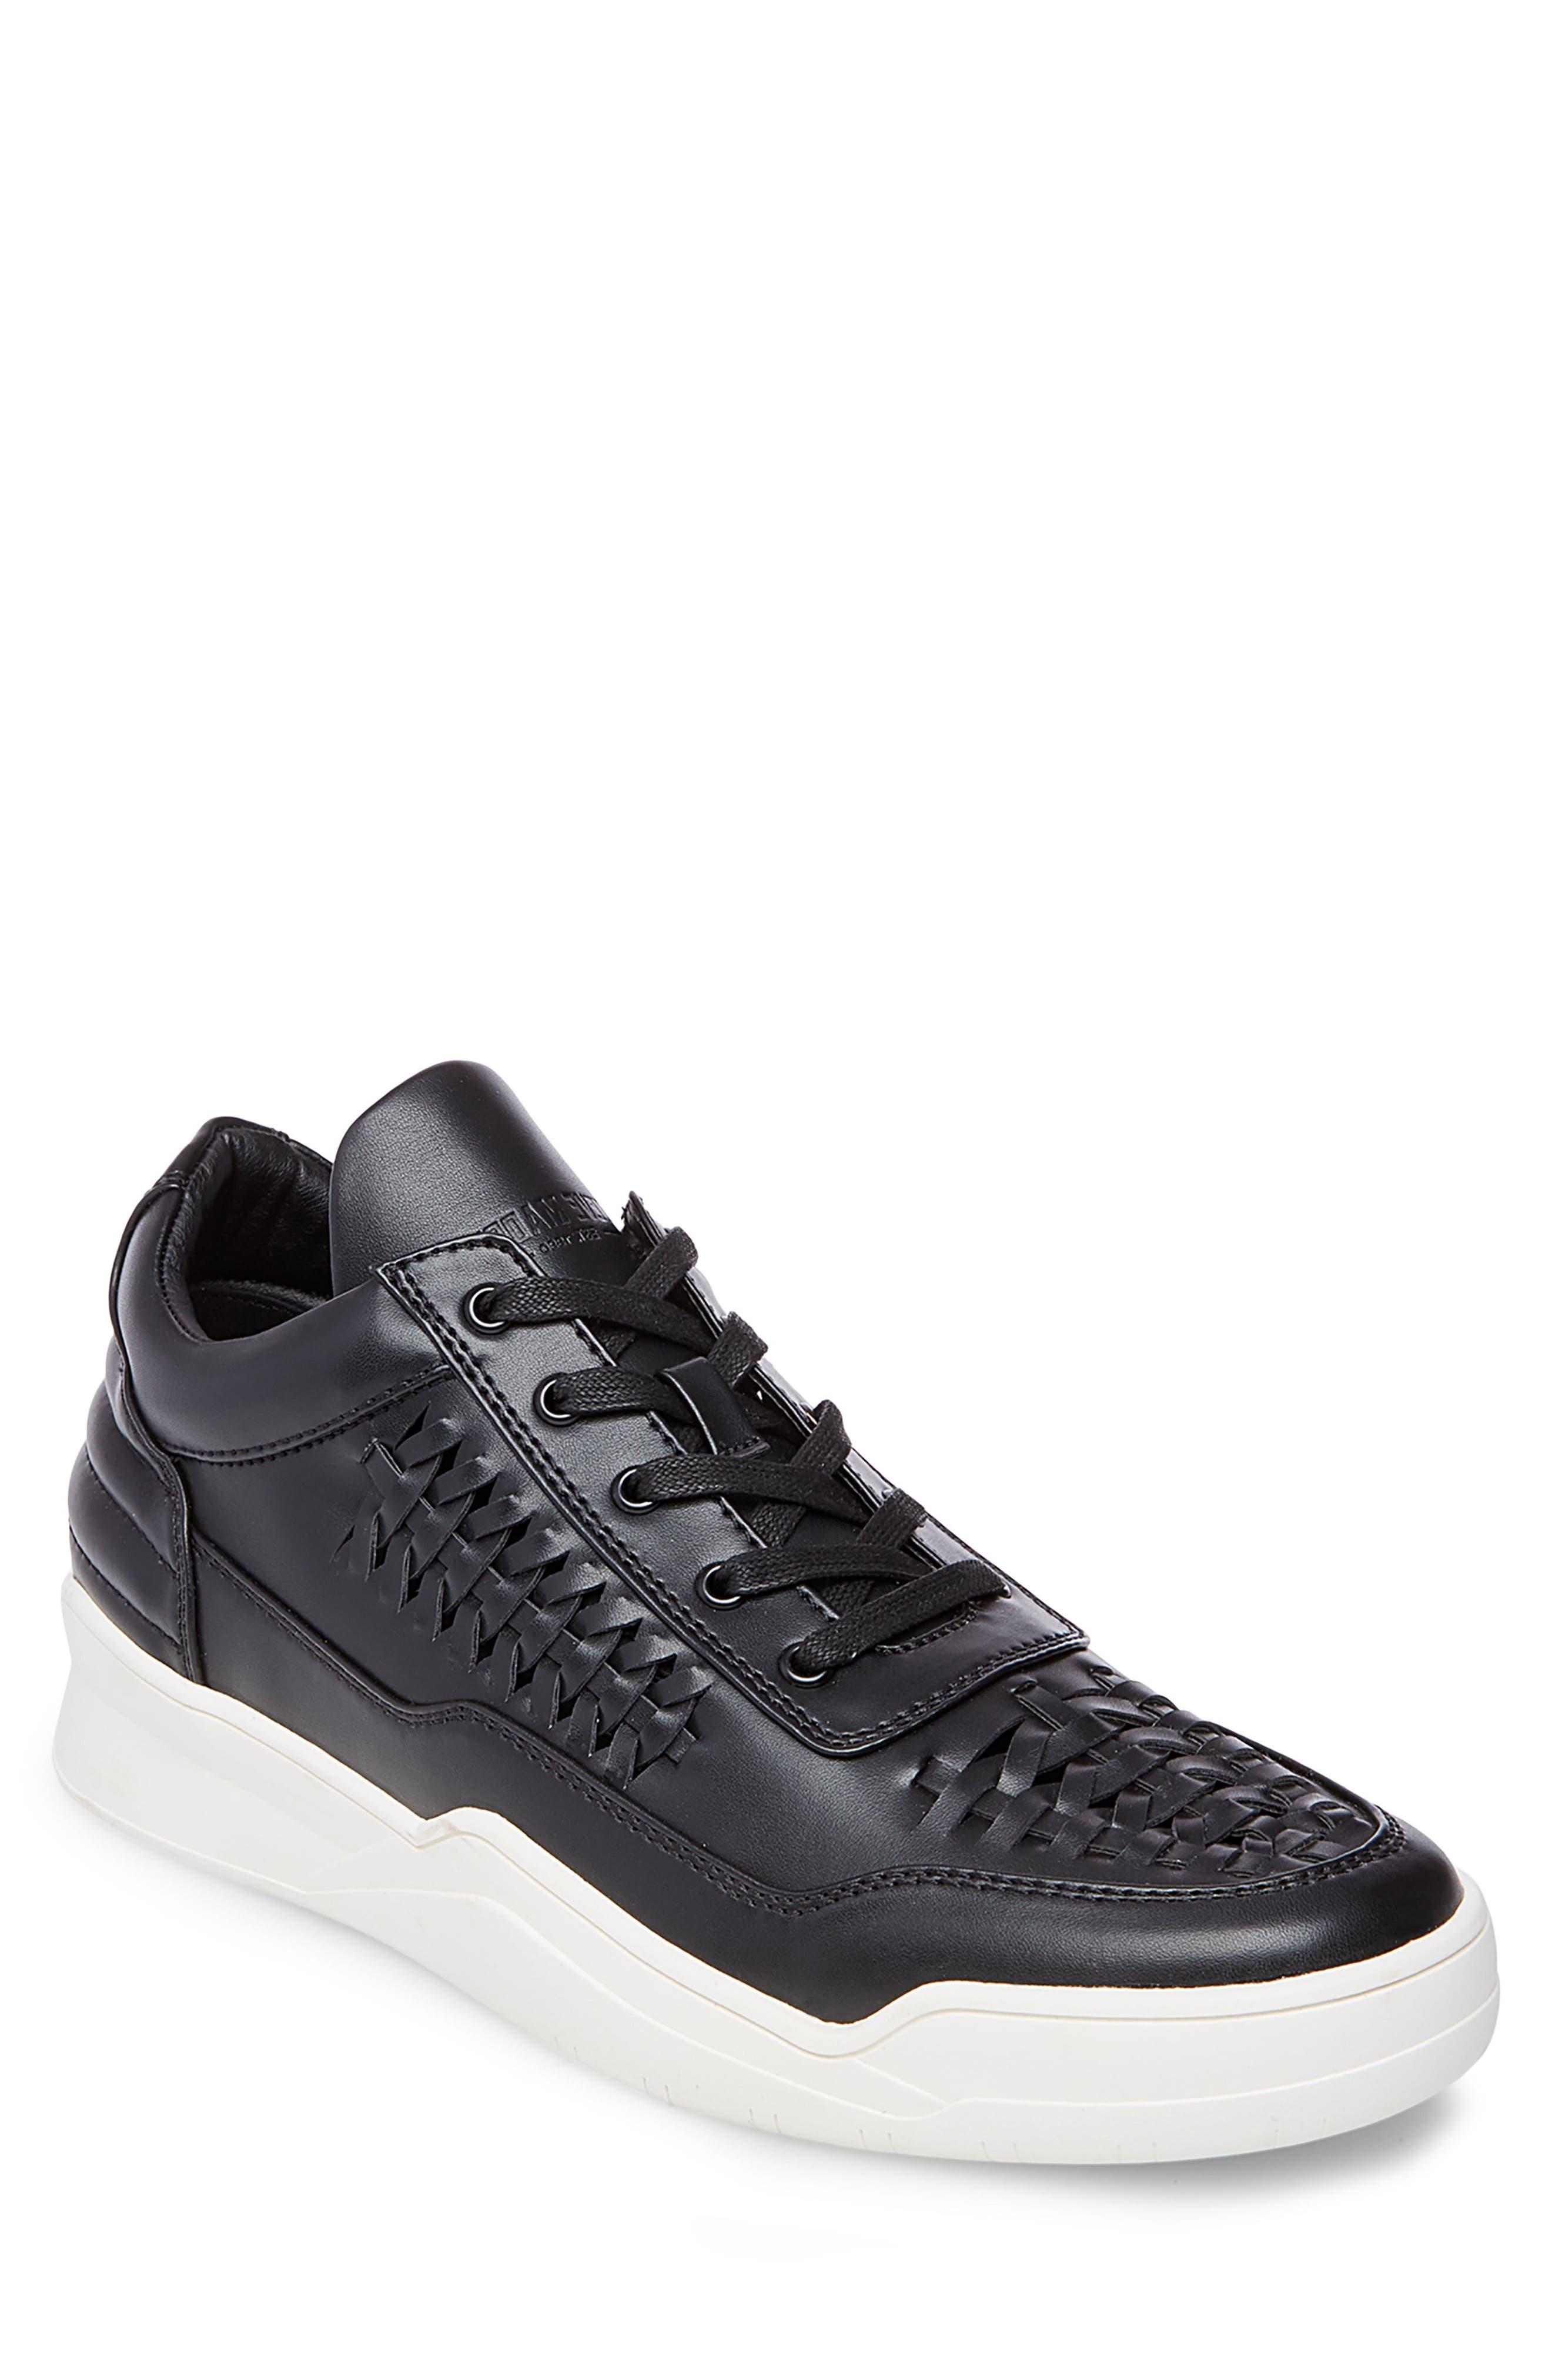 Valor Sneaker,                             Main thumbnail 1, color,                             001